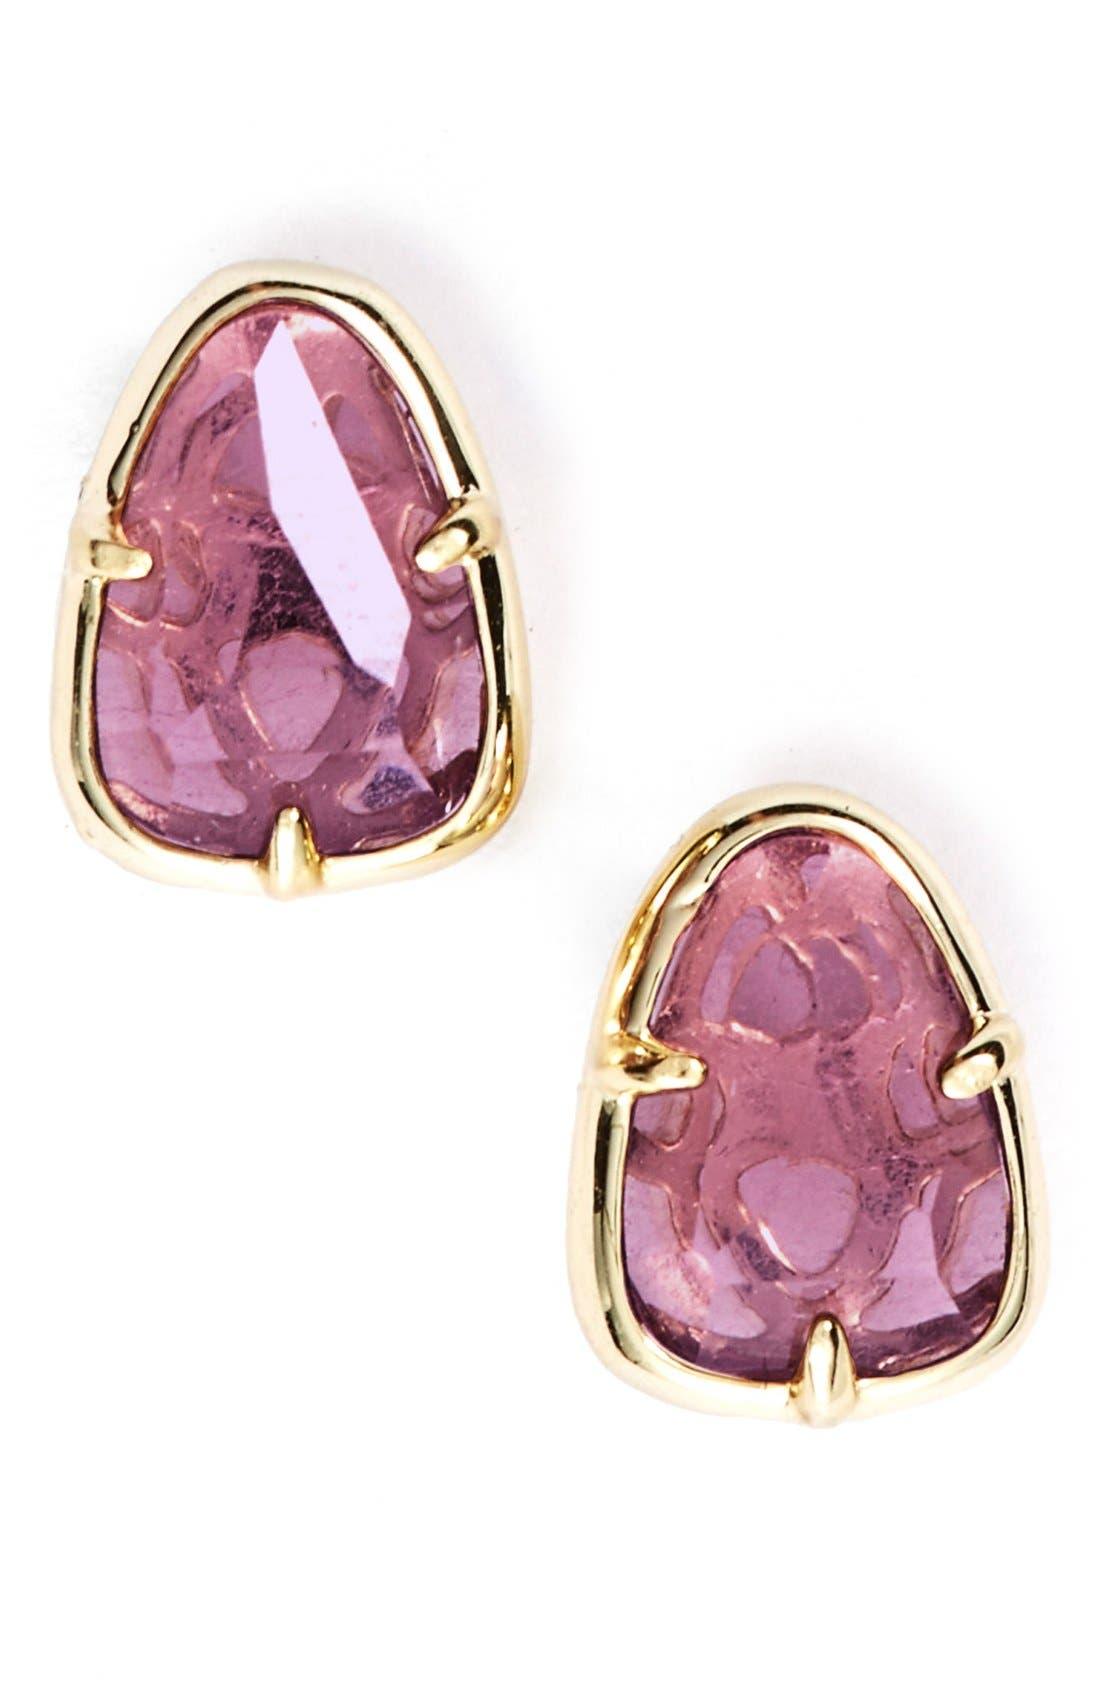 Alternate Image 1 Selected - Kendra Scott 'Hazel' Stone Stud Earrings